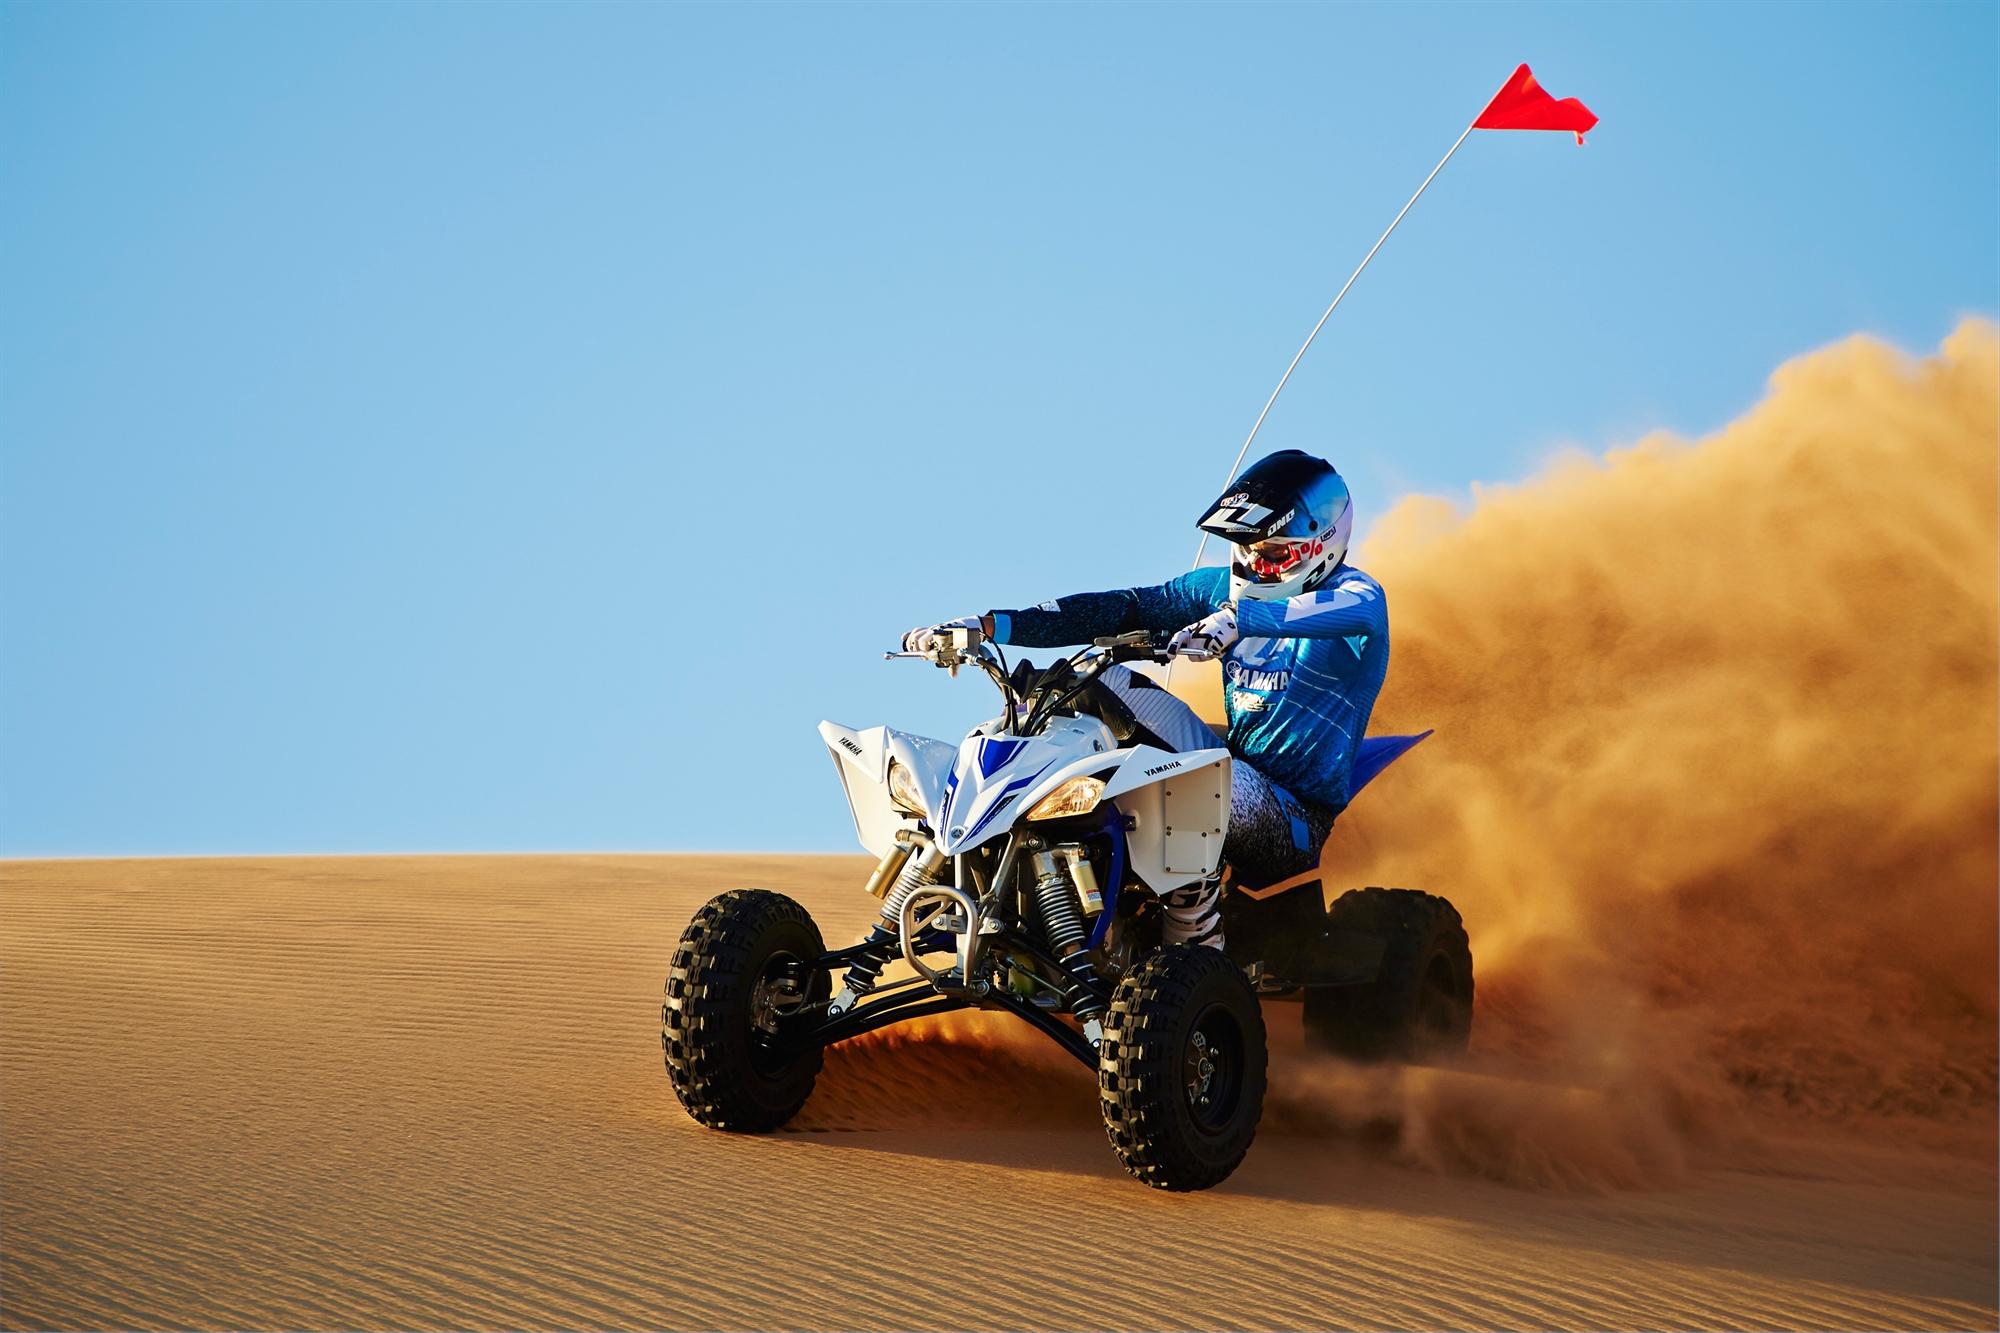 2014 Yamaha YFZ450R Brings Slipper Clutch to the ATV World ...